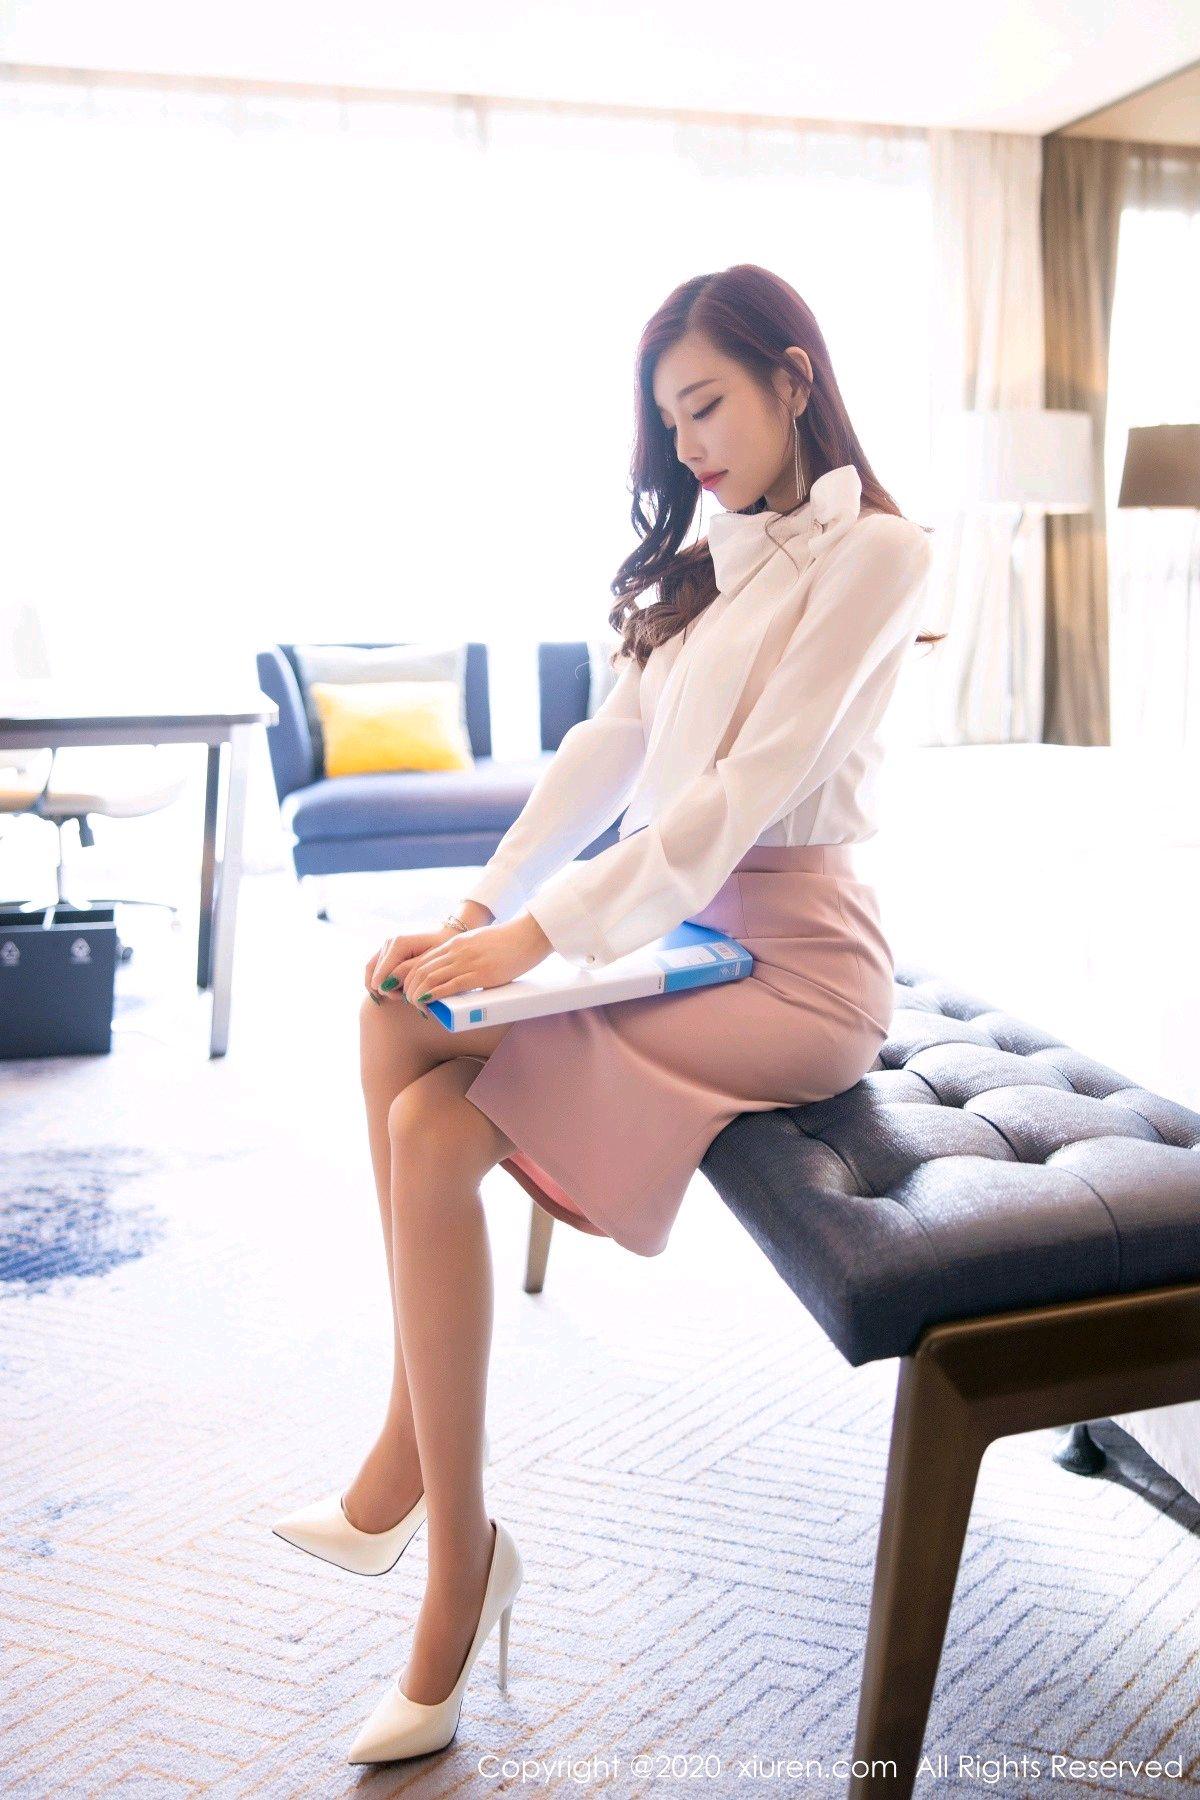 [XiuRen] Vol.2431 Yang Chen Chen 7P, Tall, Underwear, Uniform, Xiuren, Yang Chen Chen